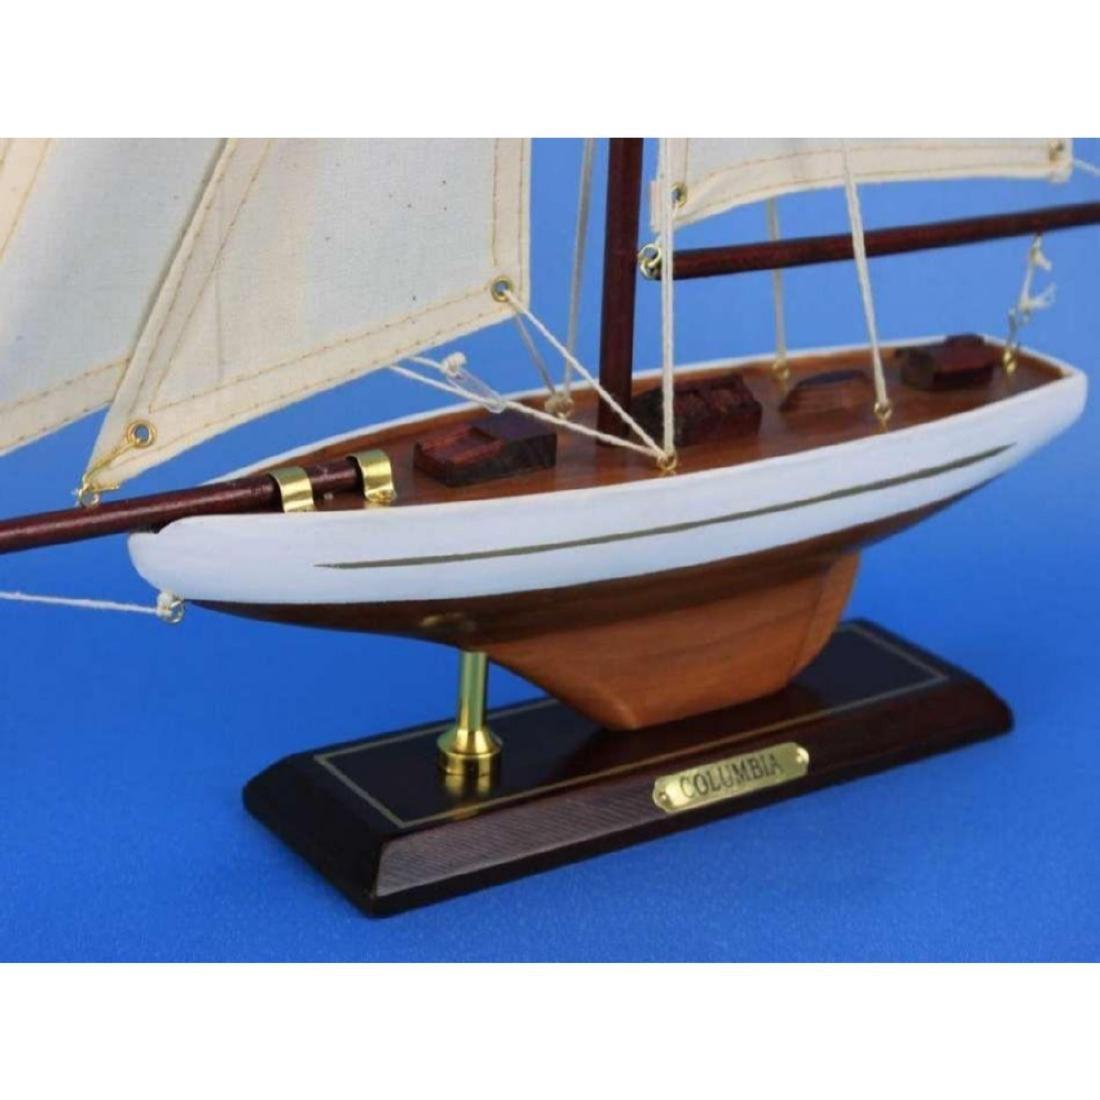 "Wooden Columbia Model Sailboat Decoration 16"" - 8"